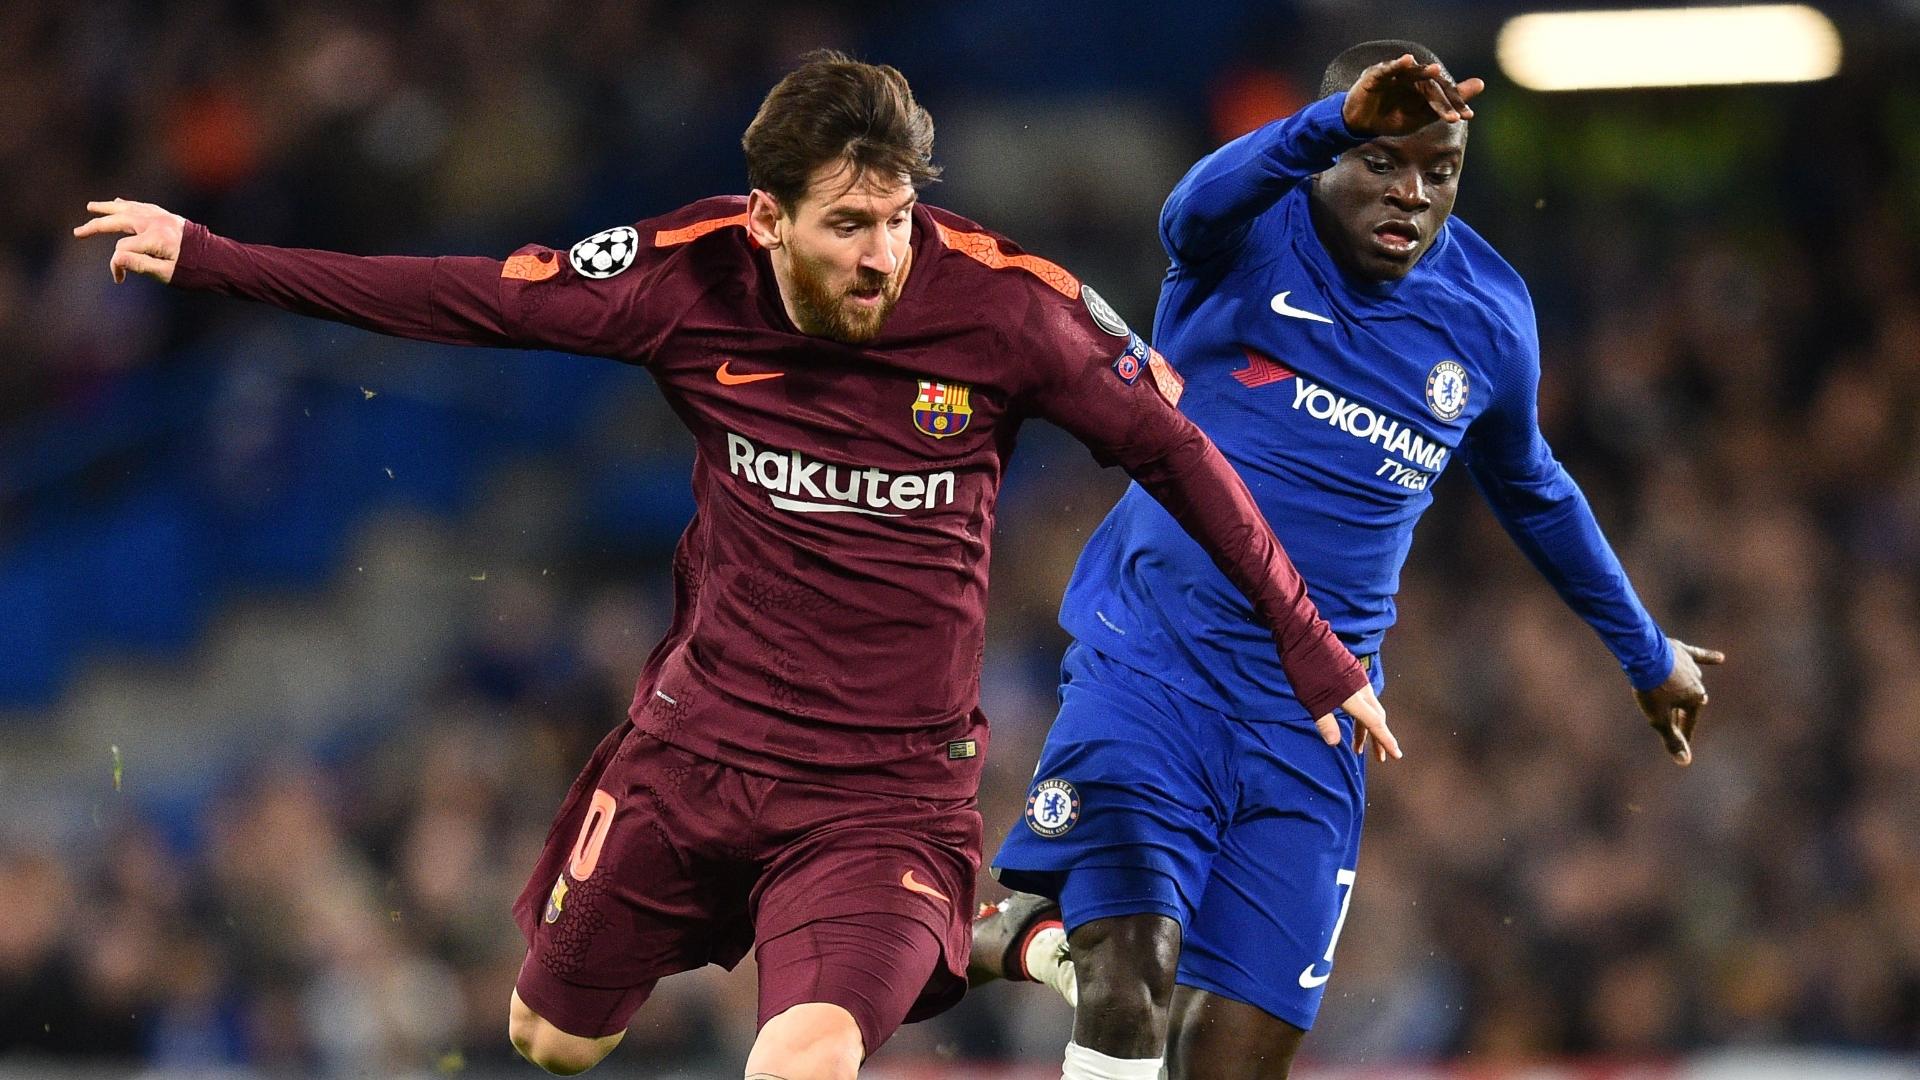 Lionel Messi, N'Golo Kante, Chelsea vs Barcelona